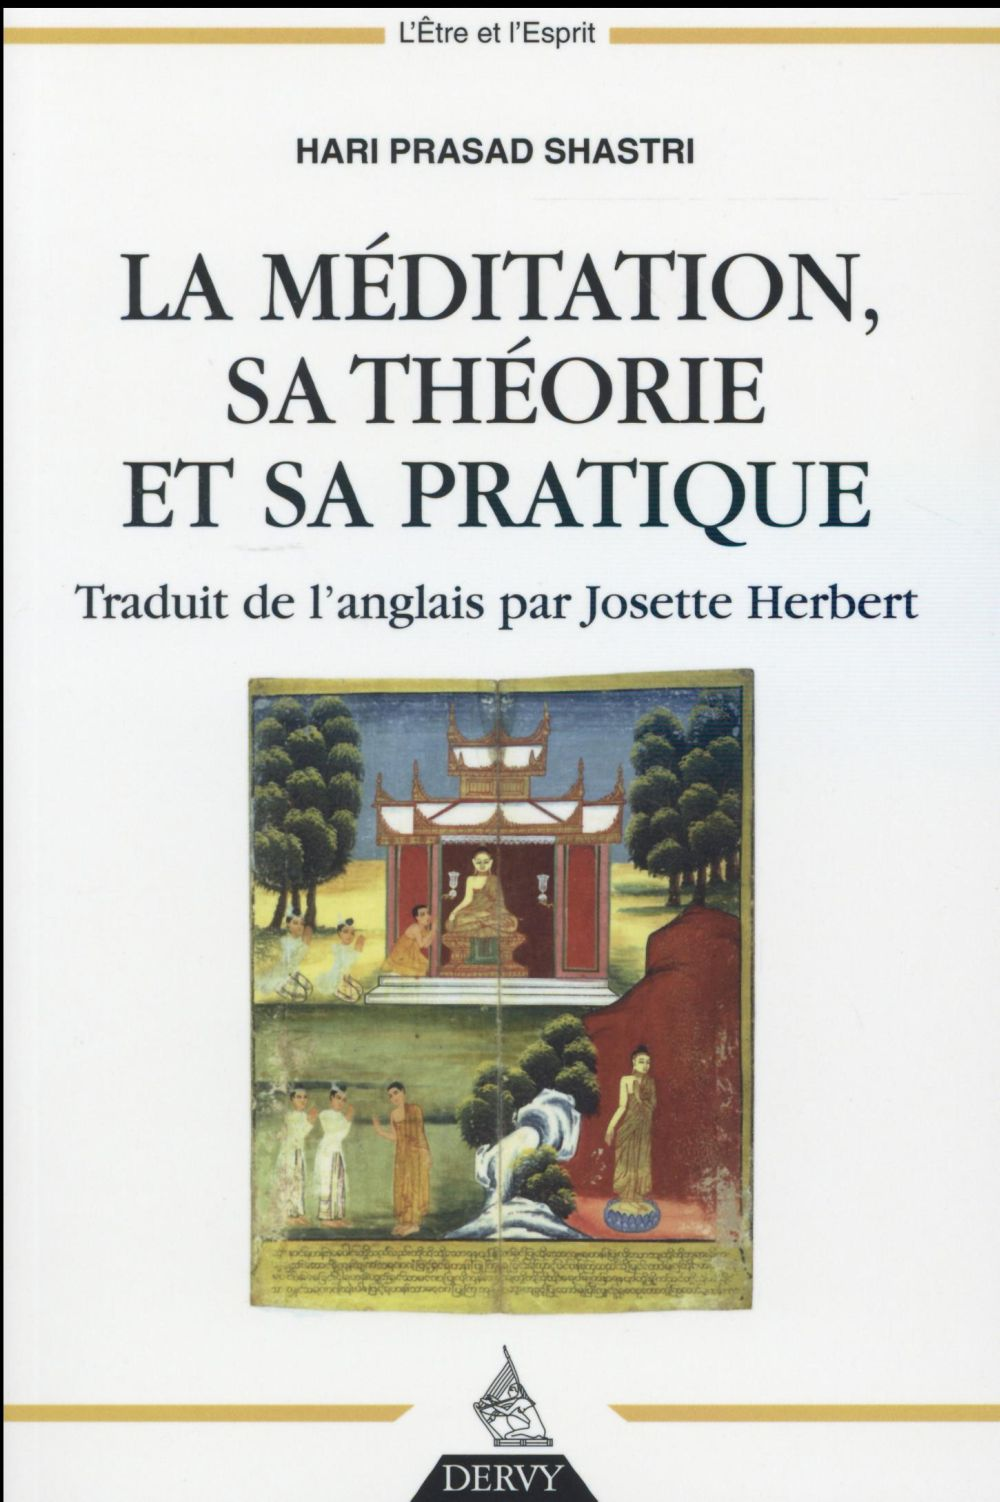 LA MEDITATION, SA THEORIE ET SA PRATIQUE